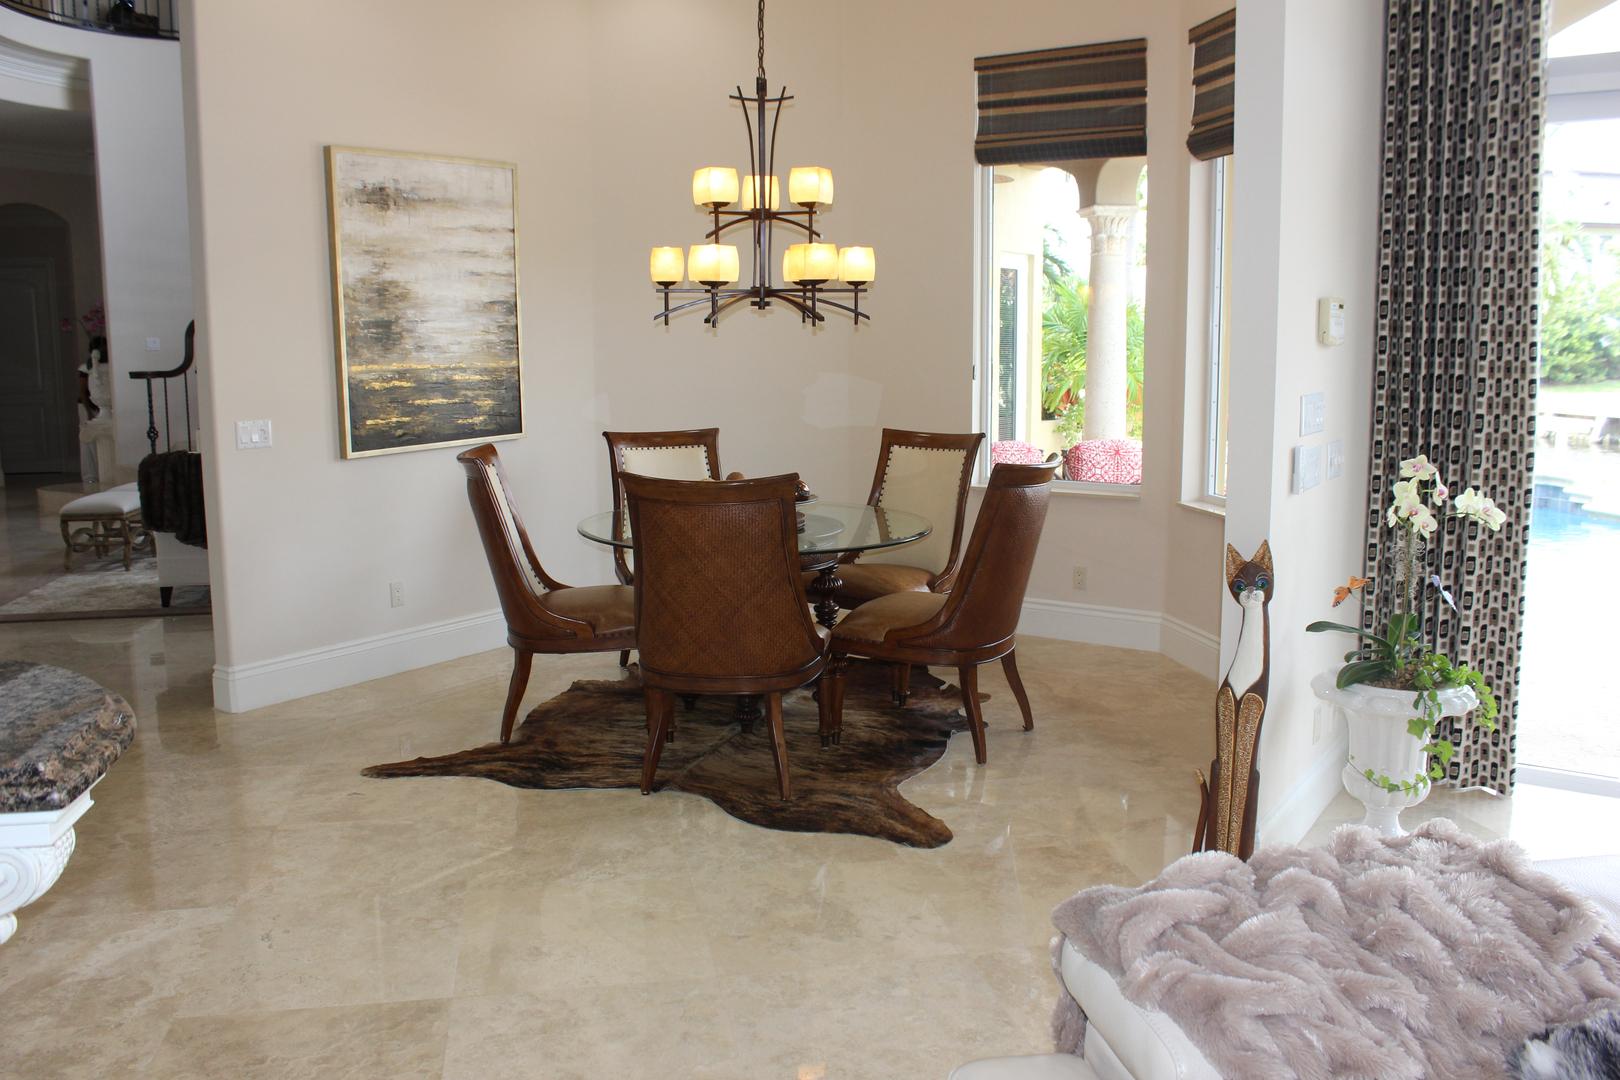 Boca Home Staging - Home Staging, interior Home Design, Interior ...